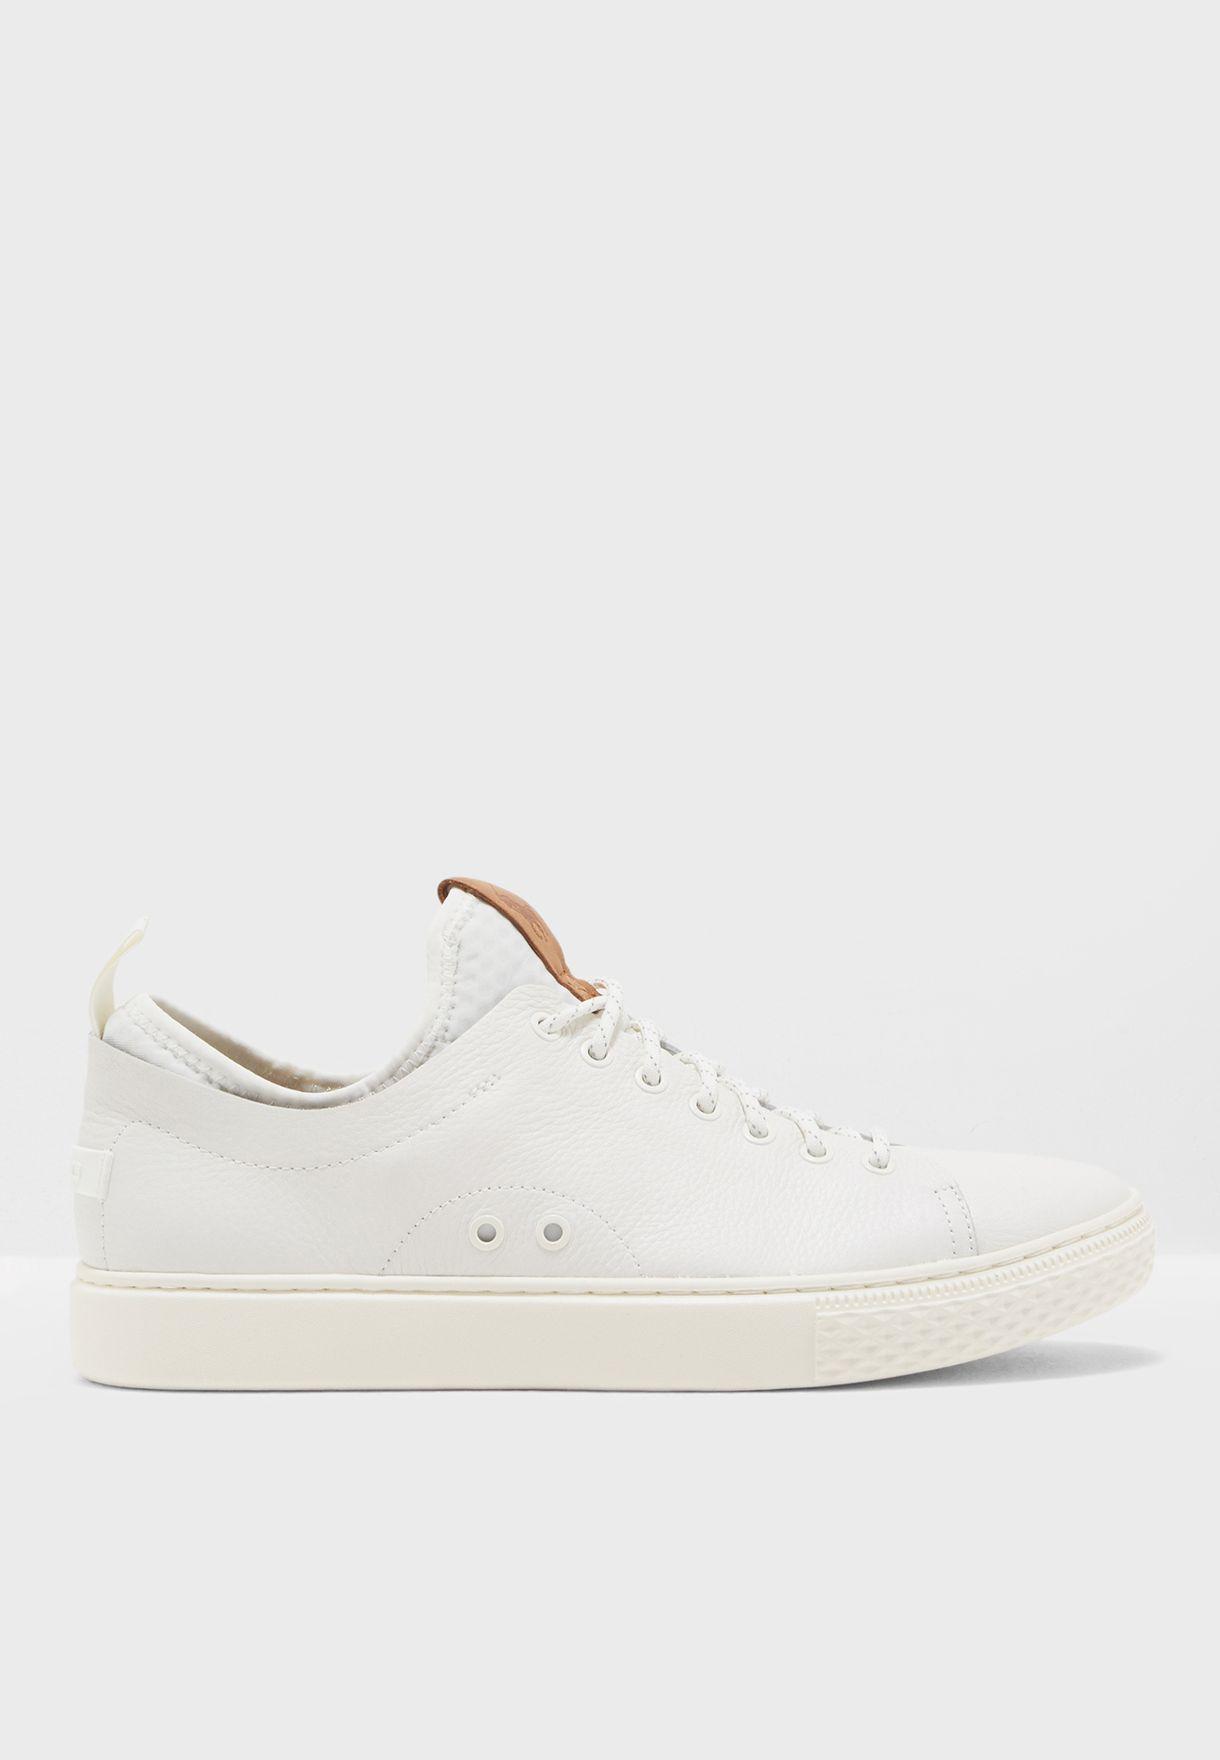 36a7b011d4c4 Shop Polo Ralph Lauren white Dunovin Sneakers 816713104001 for Men ...